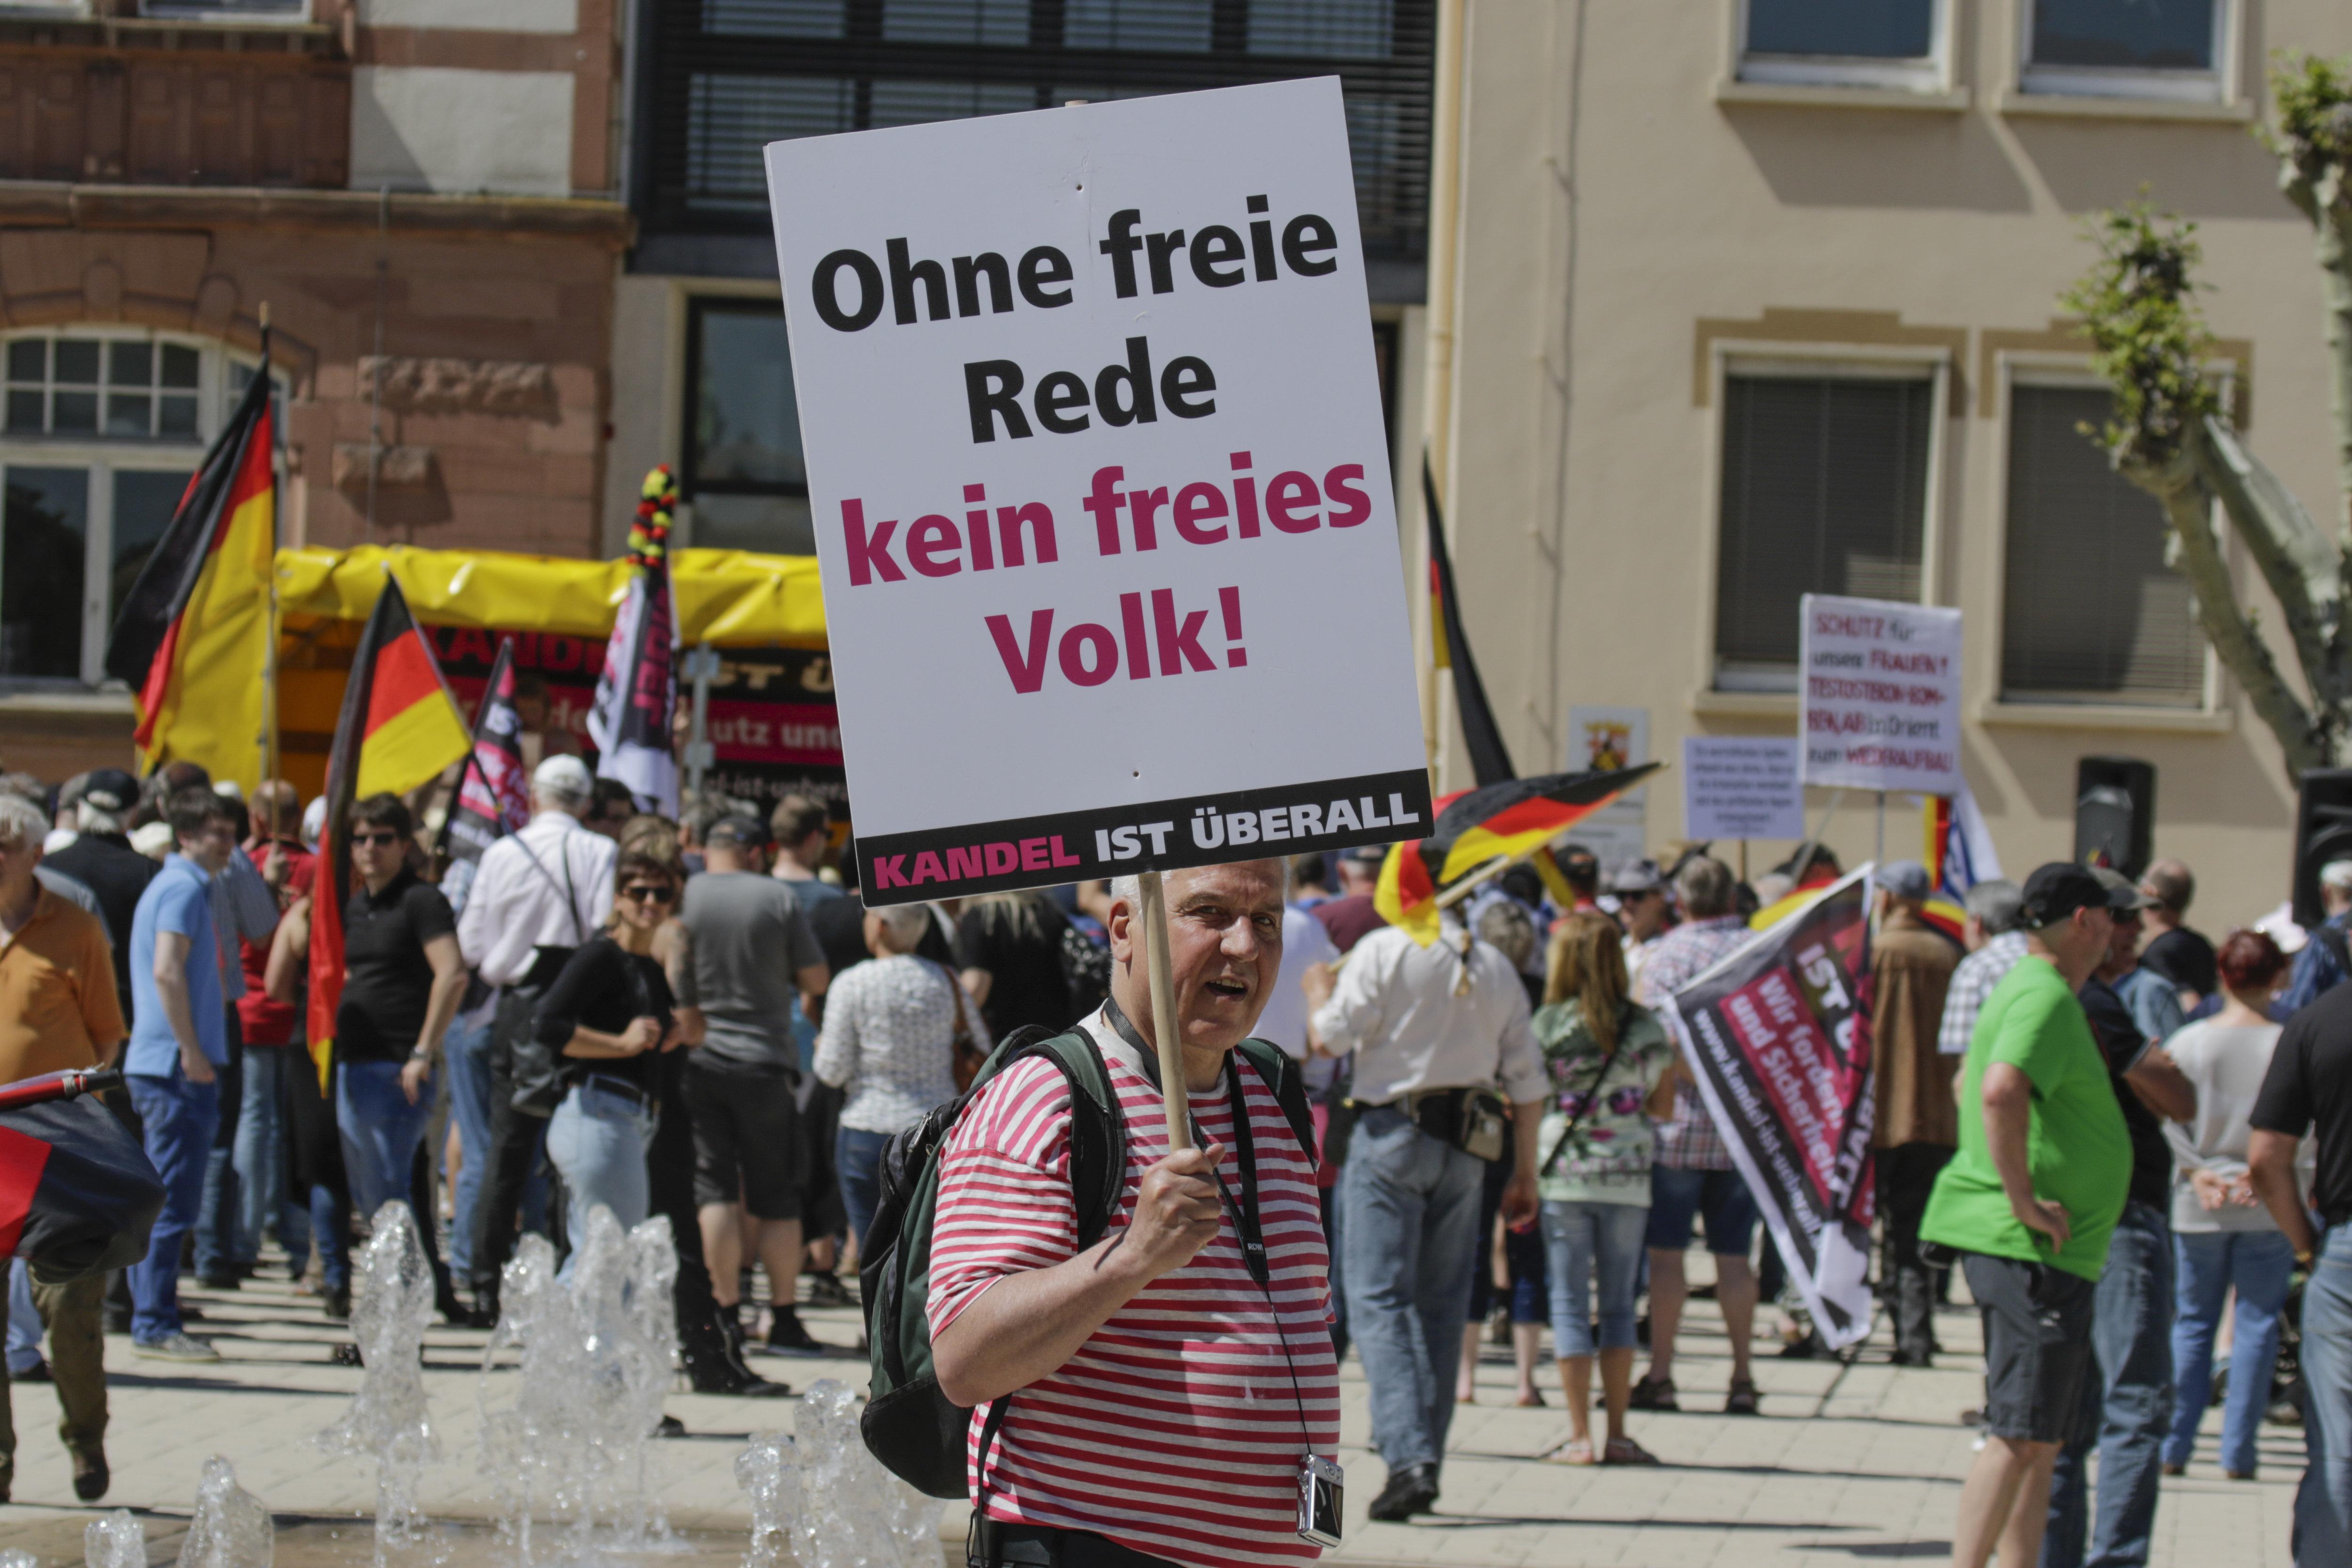 Demonising Populism Won't Work – Europe Needs A Progressive Populist